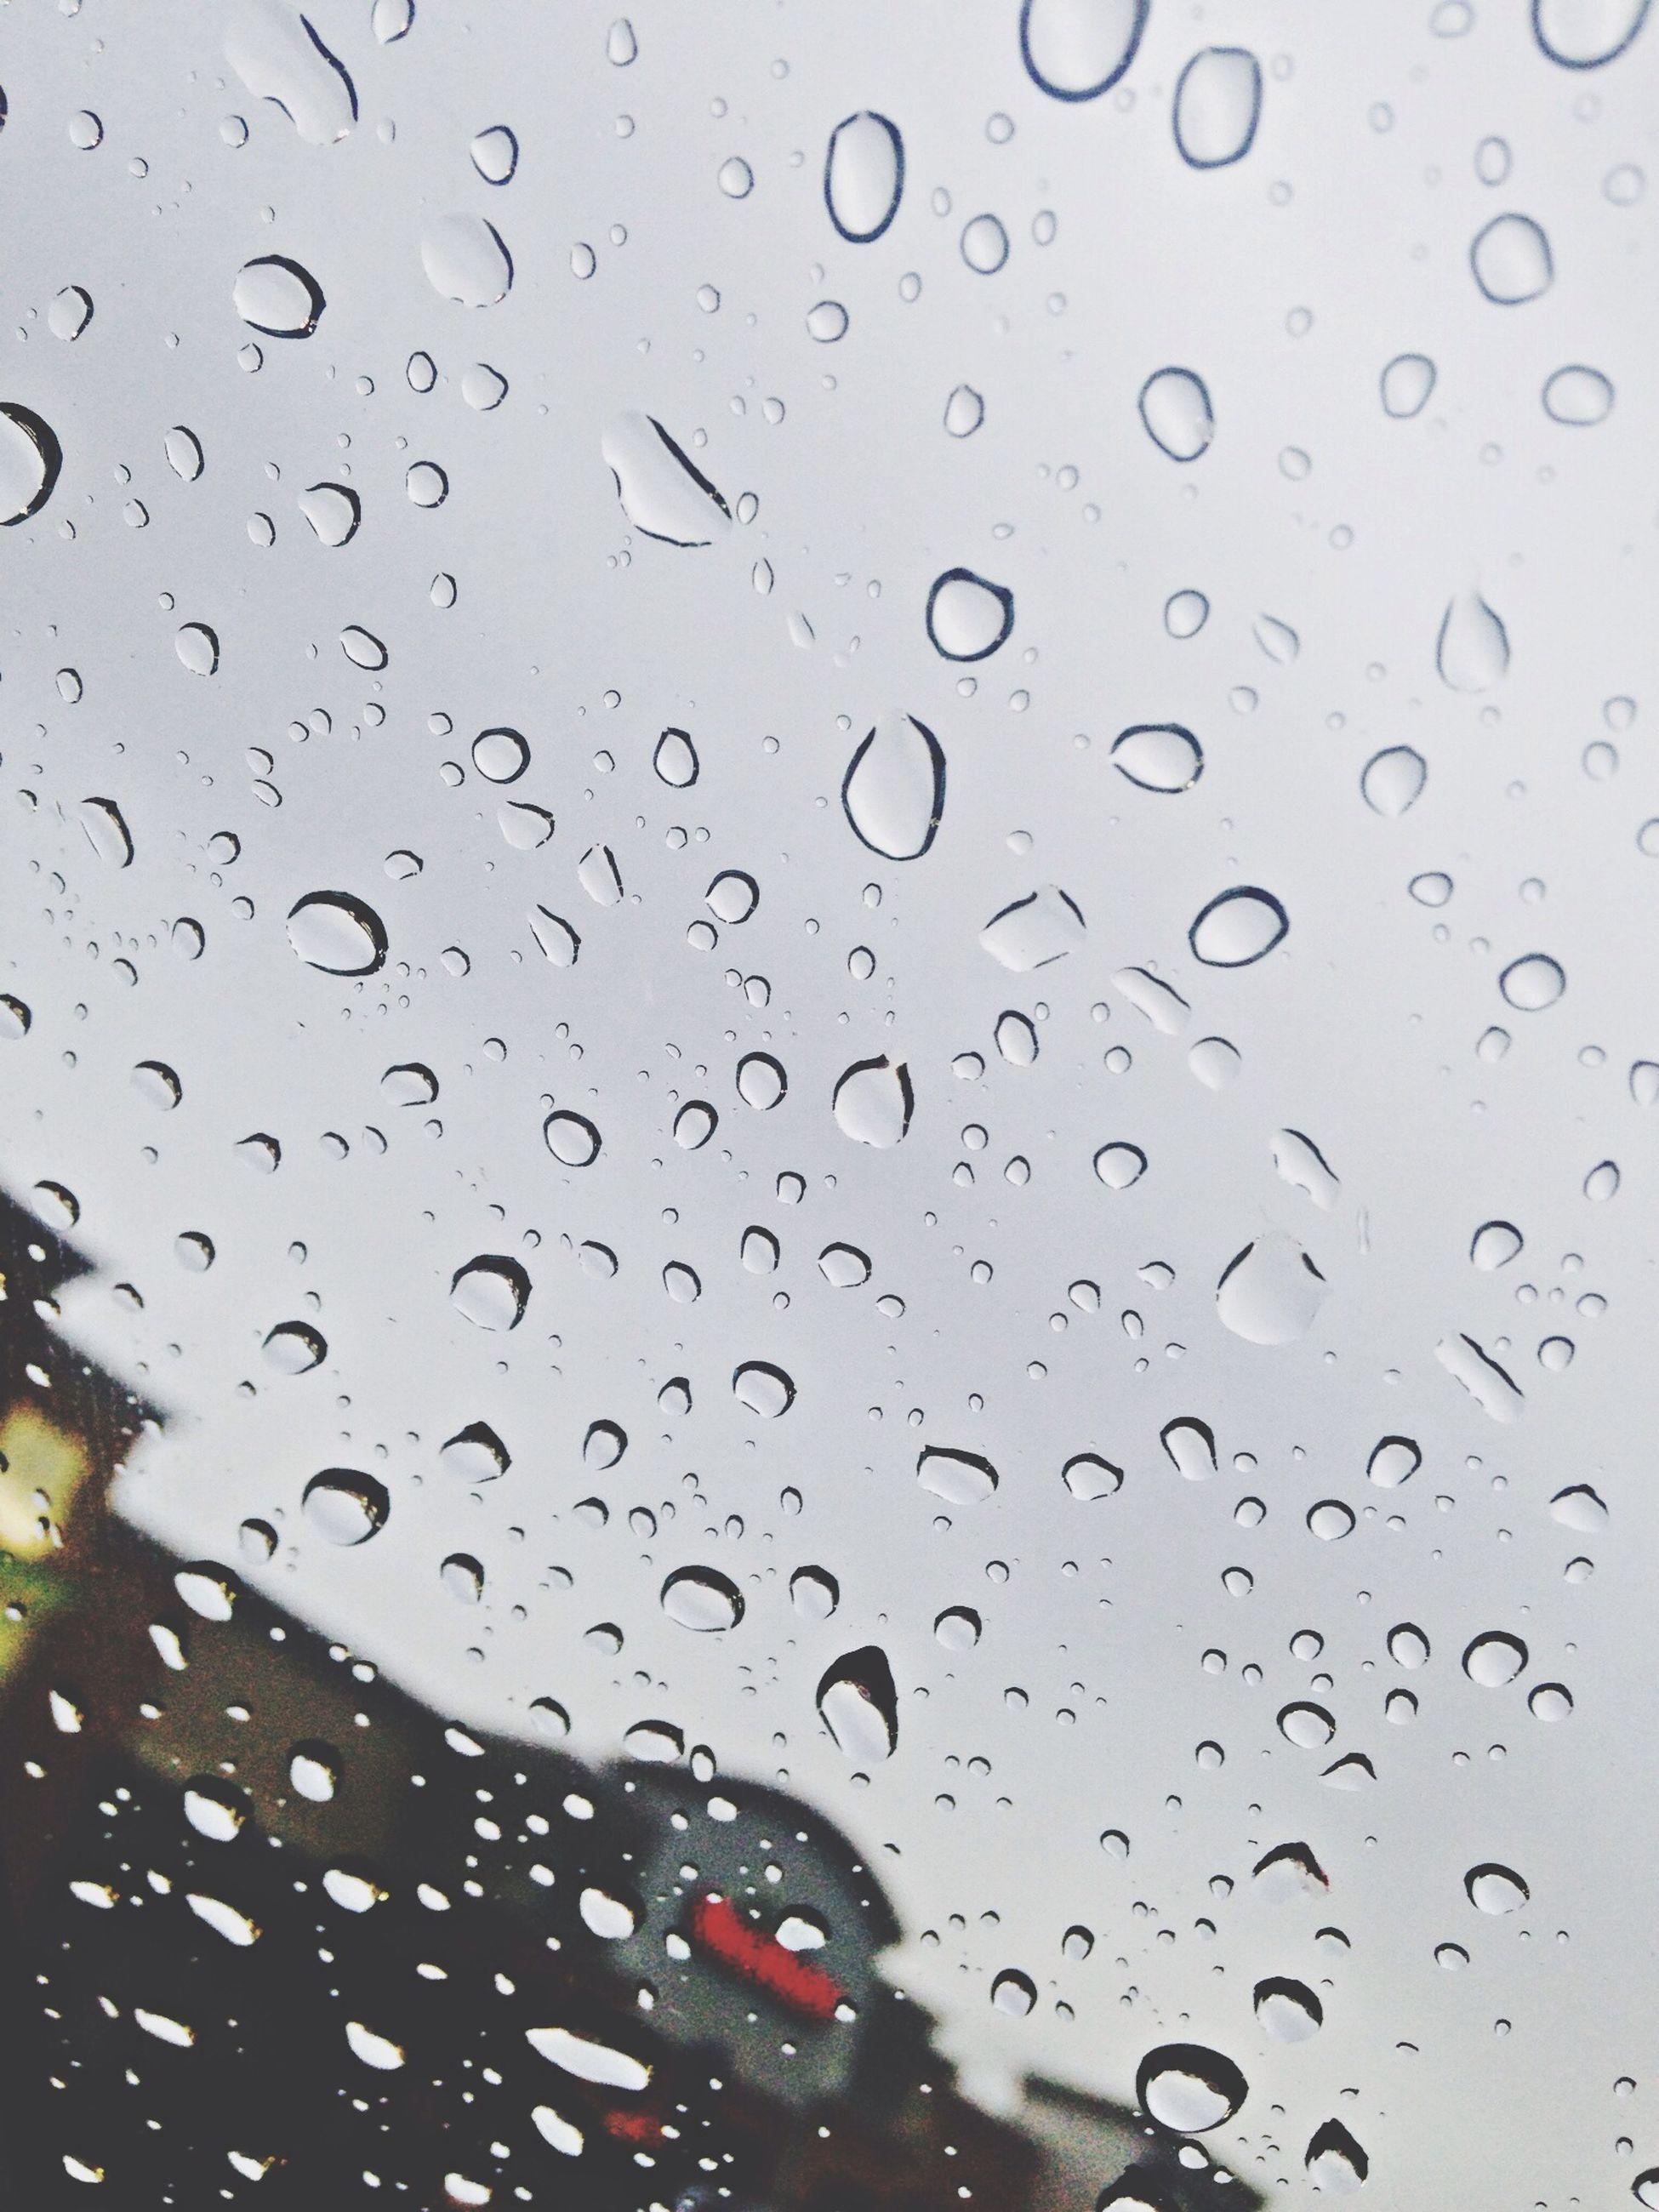 drop, wet, window, rain, transparent, transportation, glass - material, water, mode of transport, indoors, car, vehicle interior, weather, raindrop, land vehicle, car interior, season, windshield, glass, backgrounds